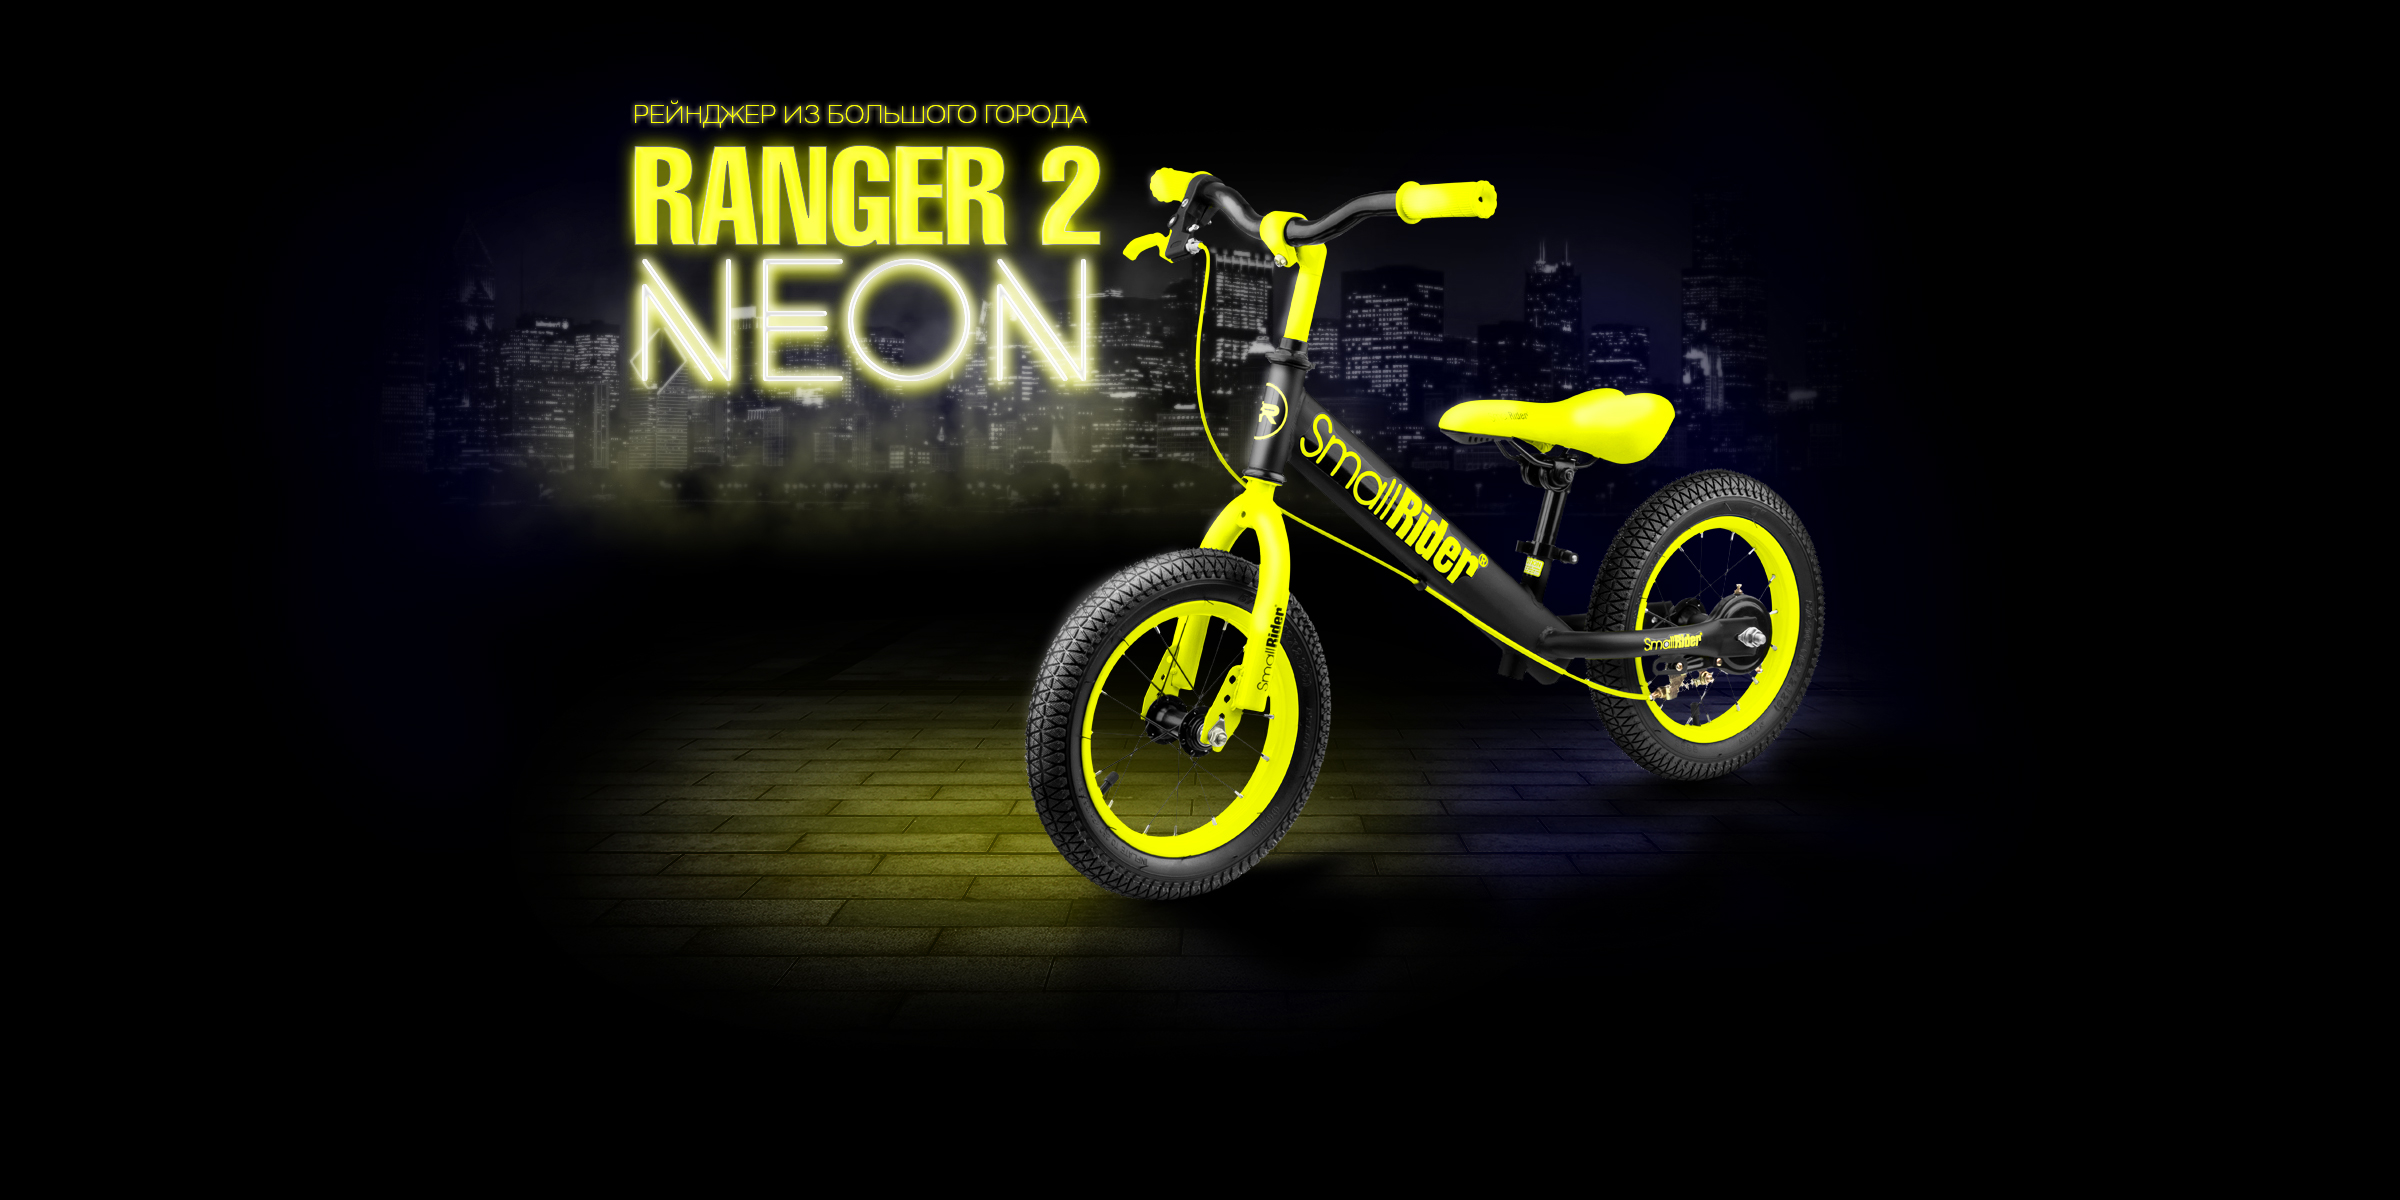 Small Rider Ranger 2 Neon